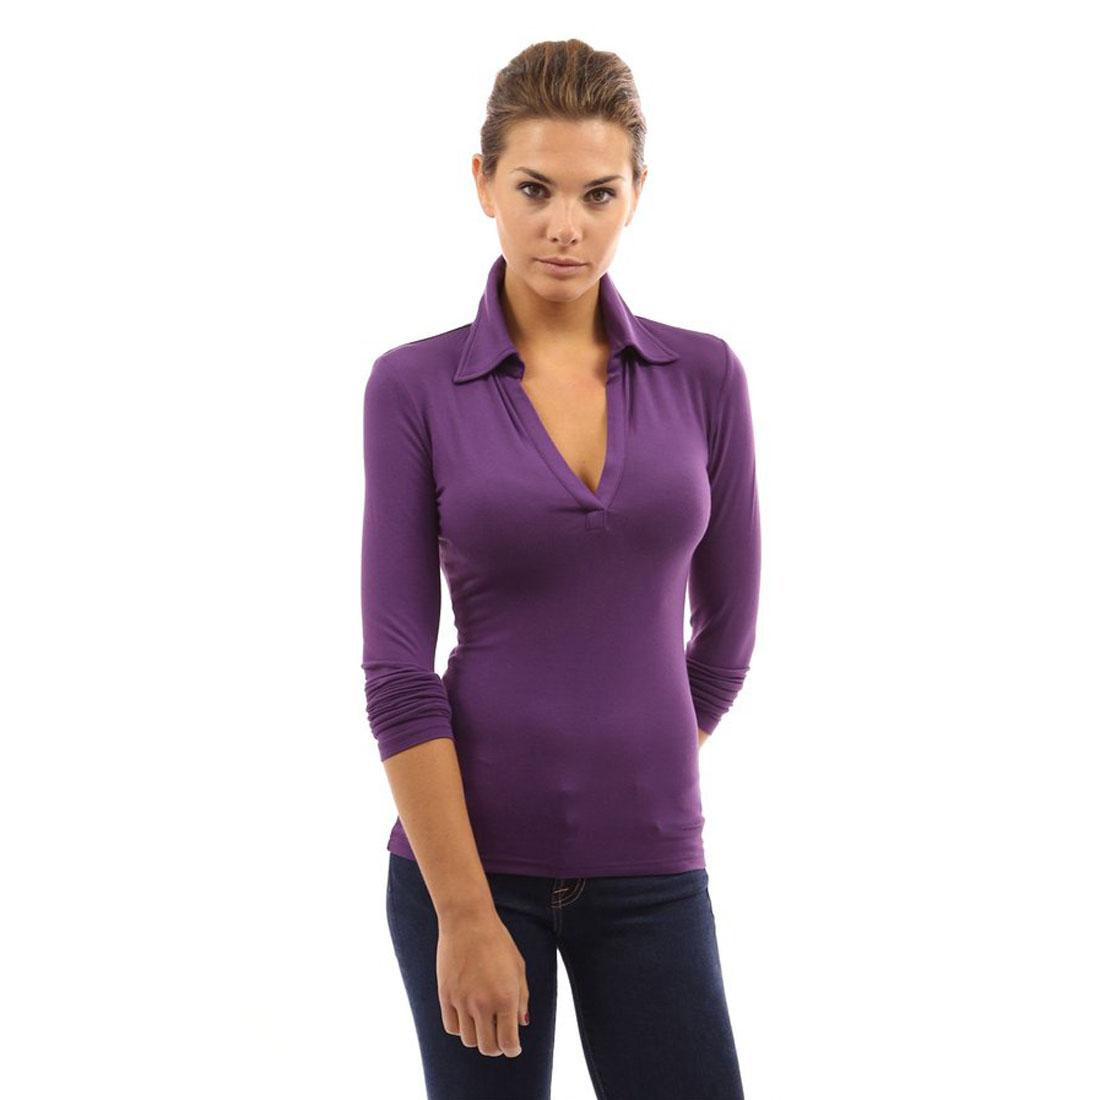 Hanes Ladies' oz., % Ringspun Cotton nano-T® V-Neck T-Shirt - S04V as low as $ Hanes oz. Tagless® ComfortSoft® Long-Sleeve Pocket T-Shirt -